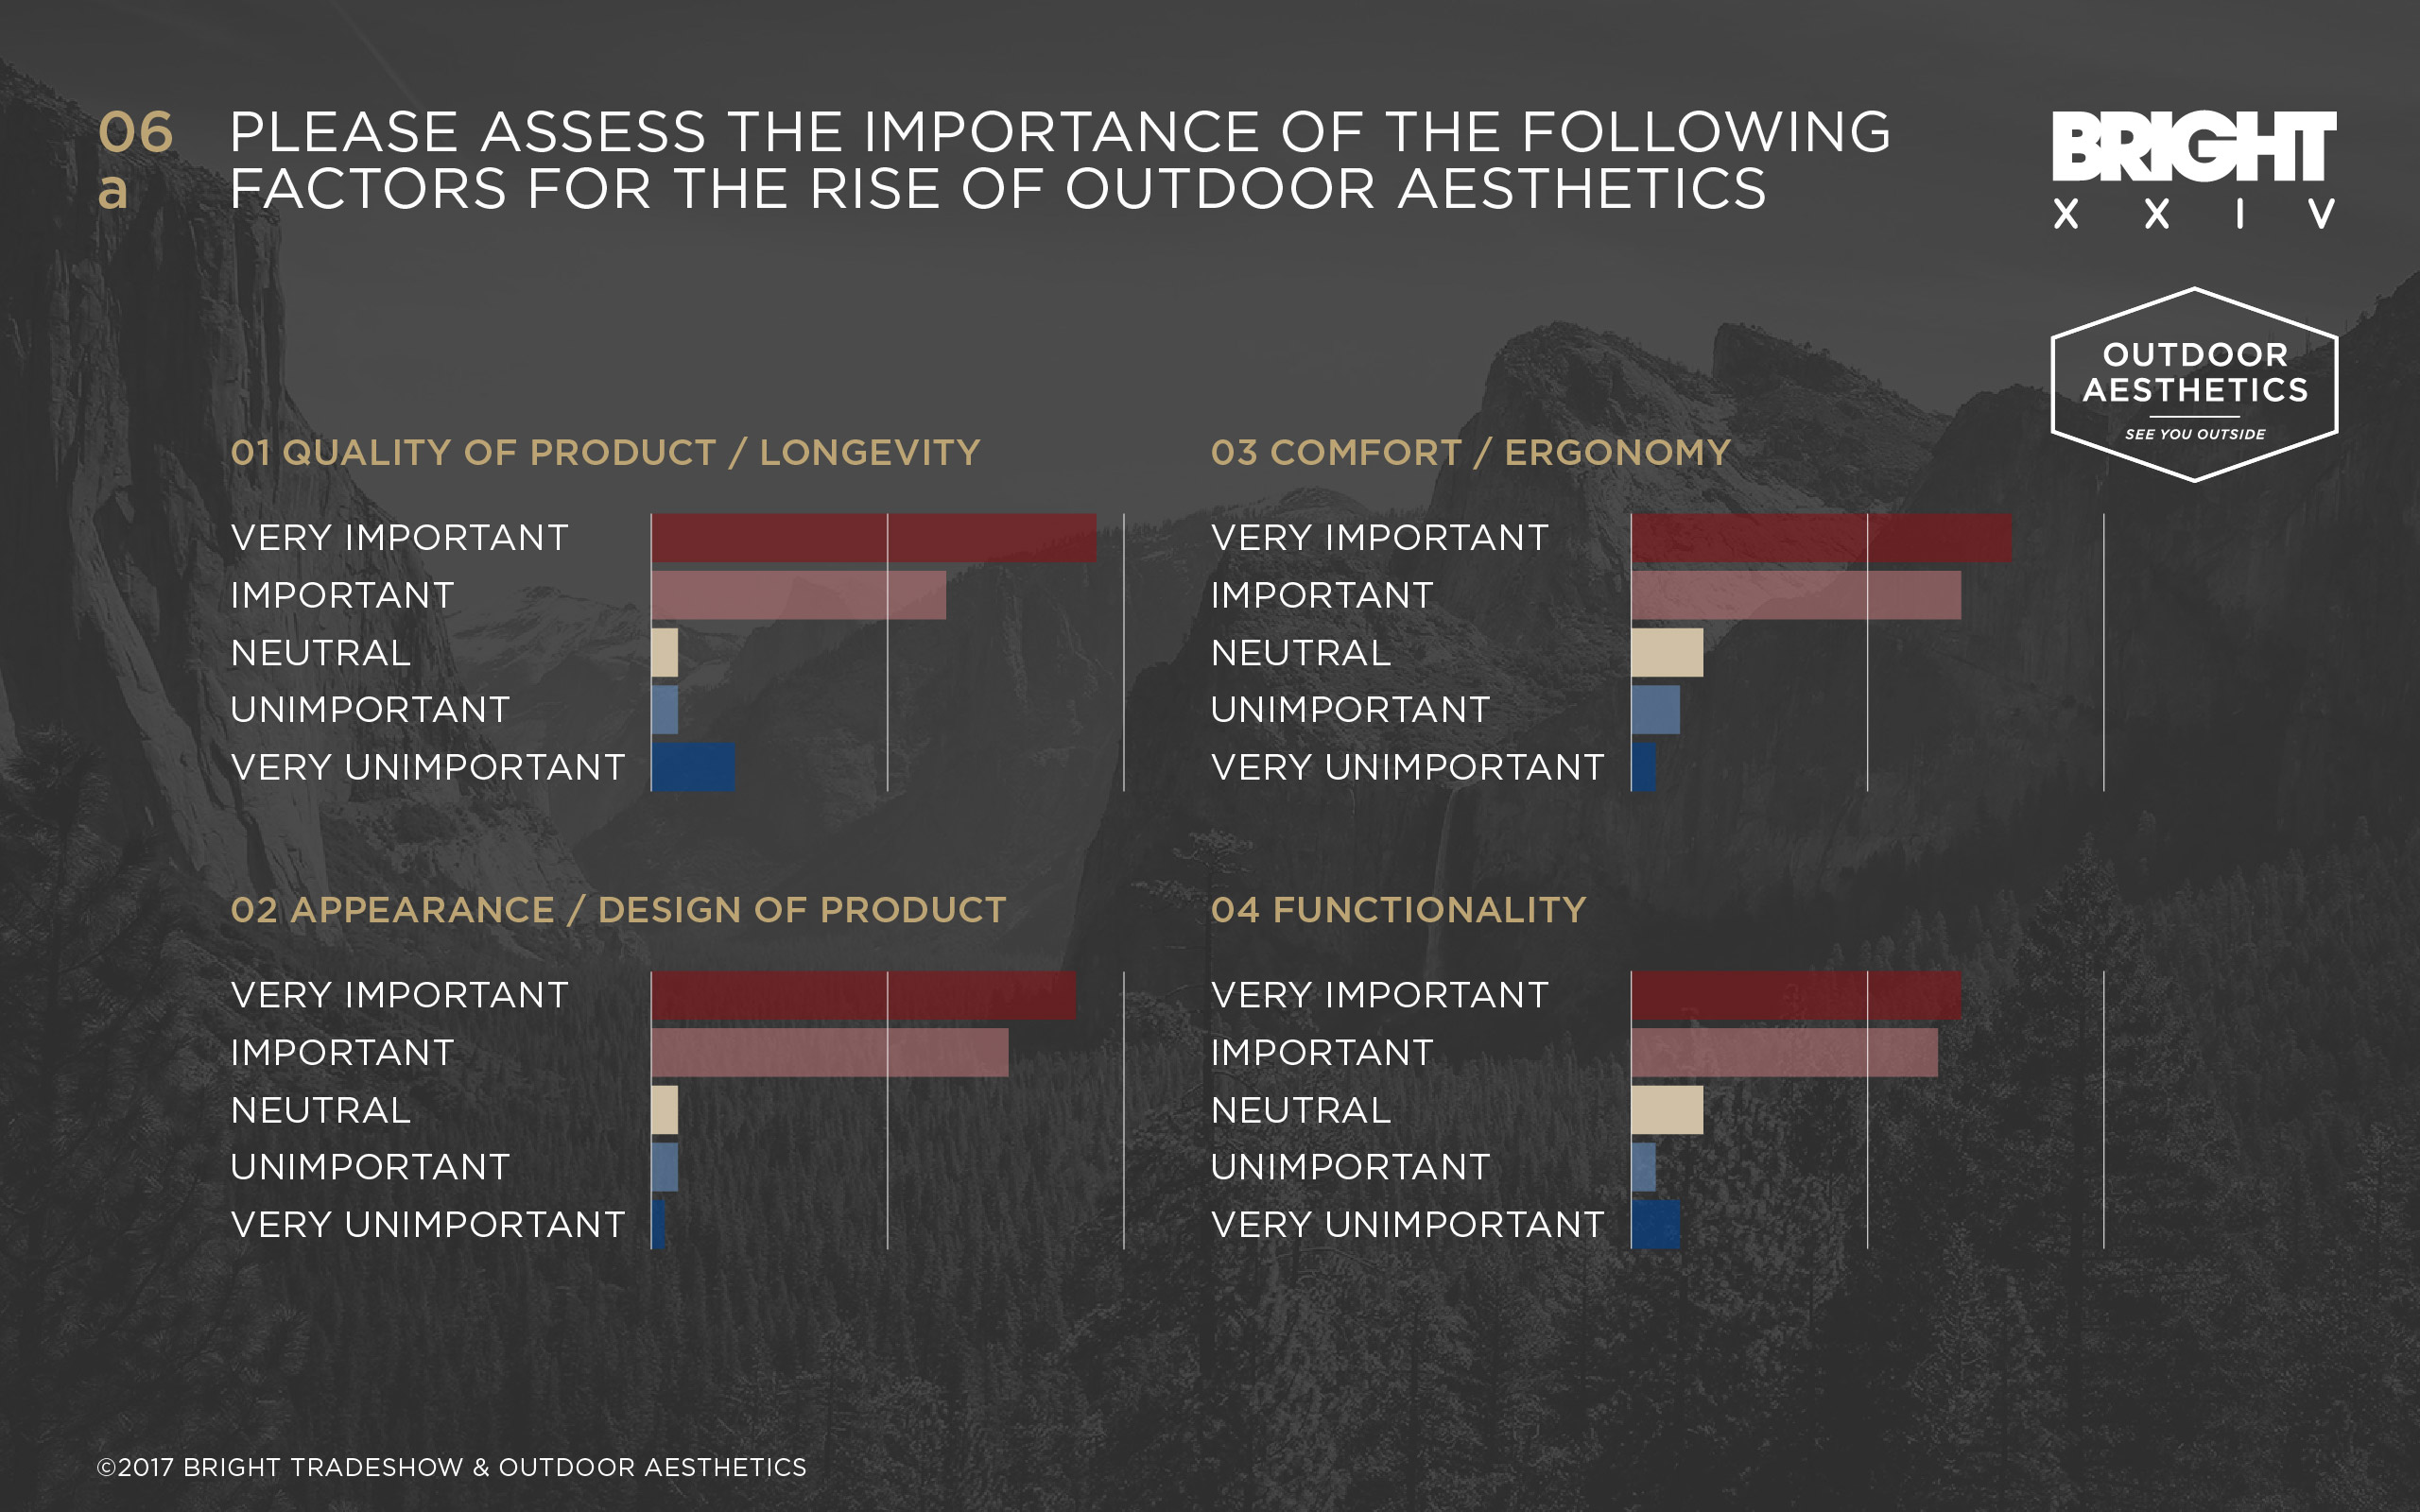 outdoor-aesthetics-trend-survey-2017-07